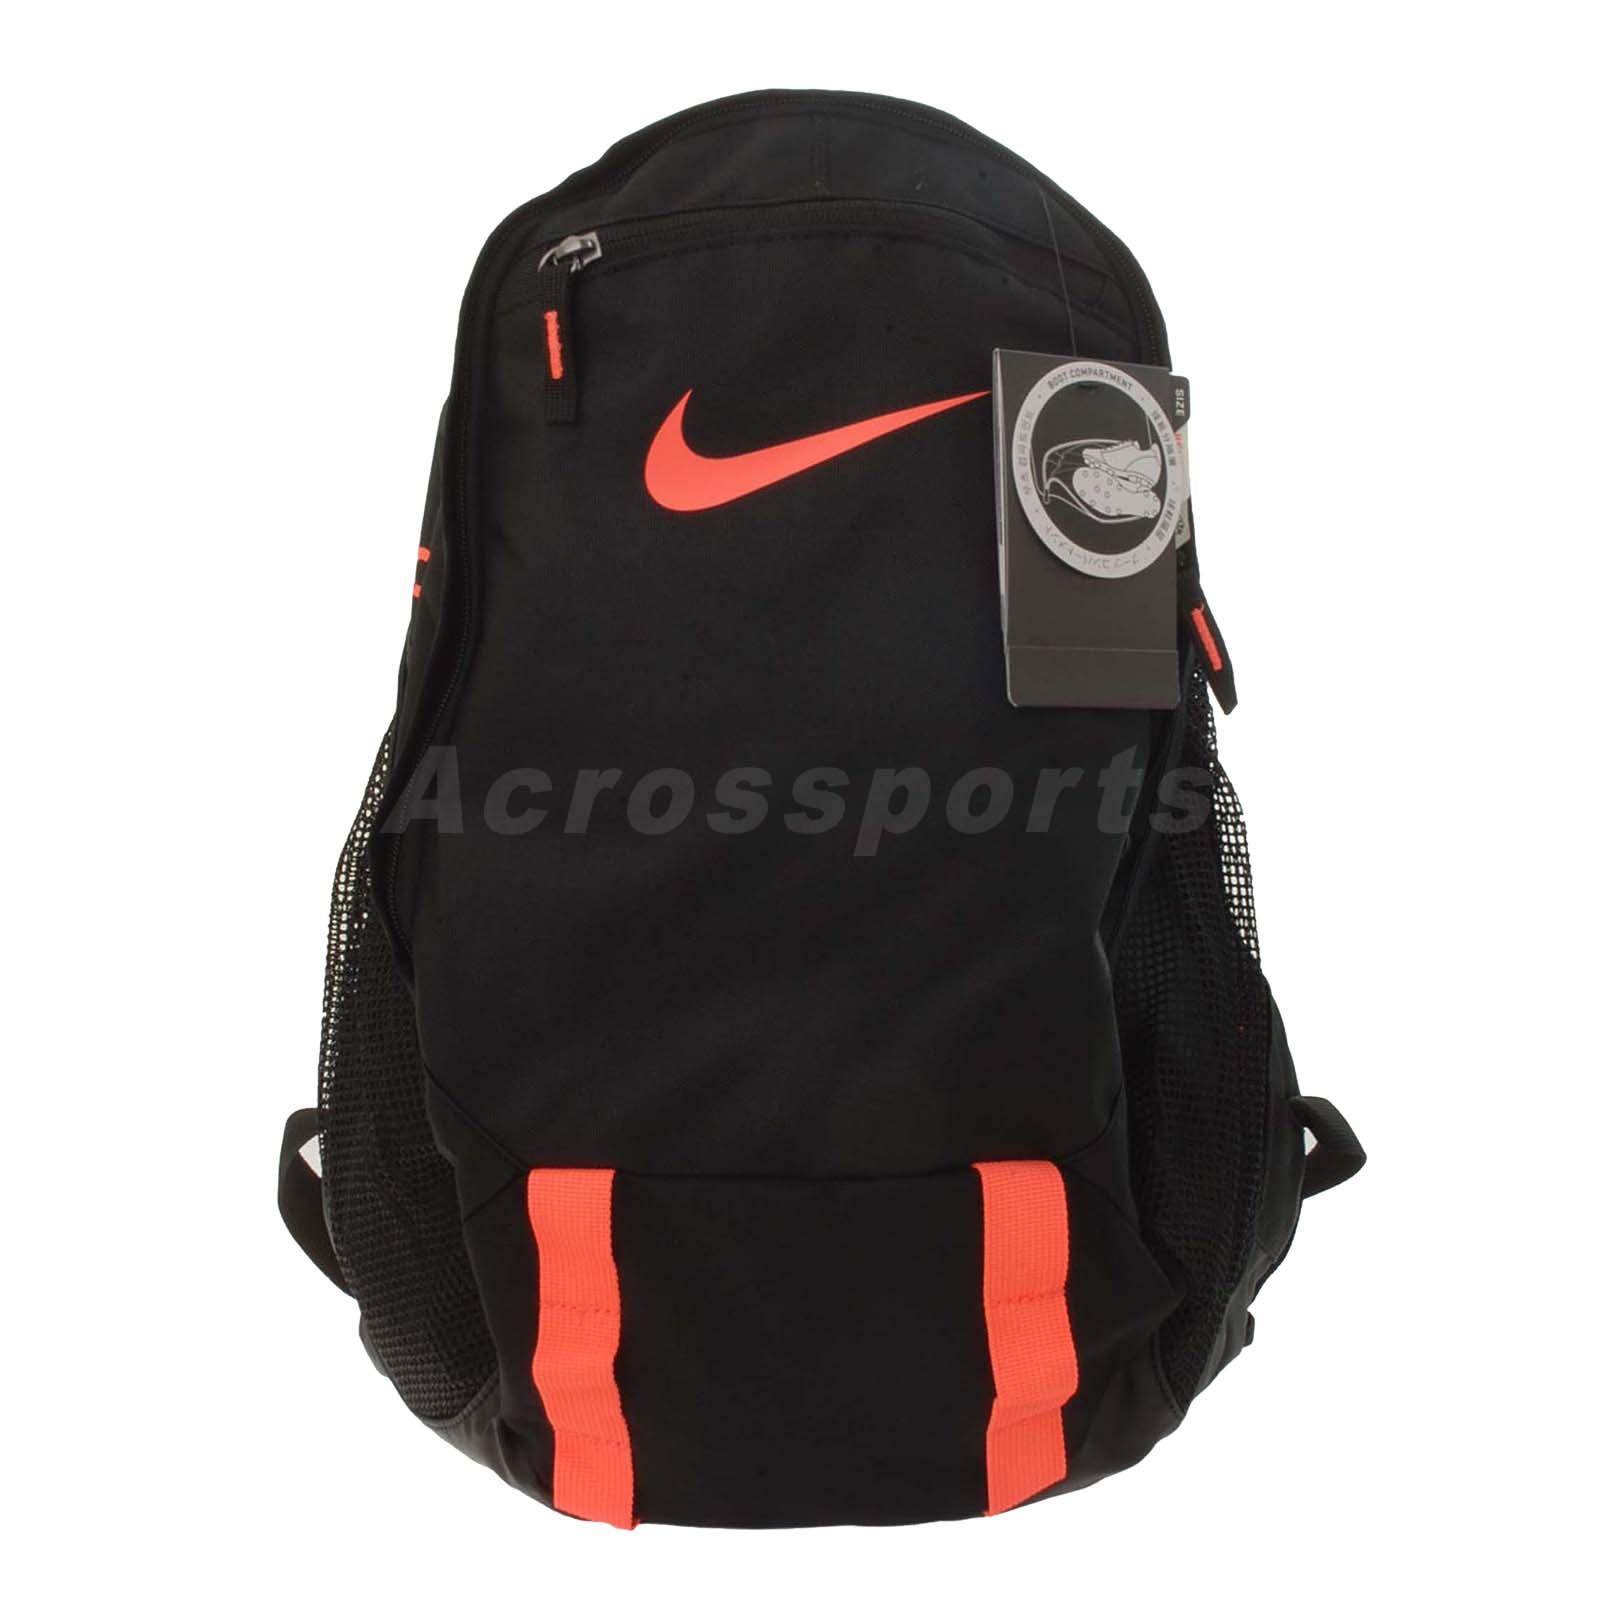 nike soccer offense compact backpack black orange boot